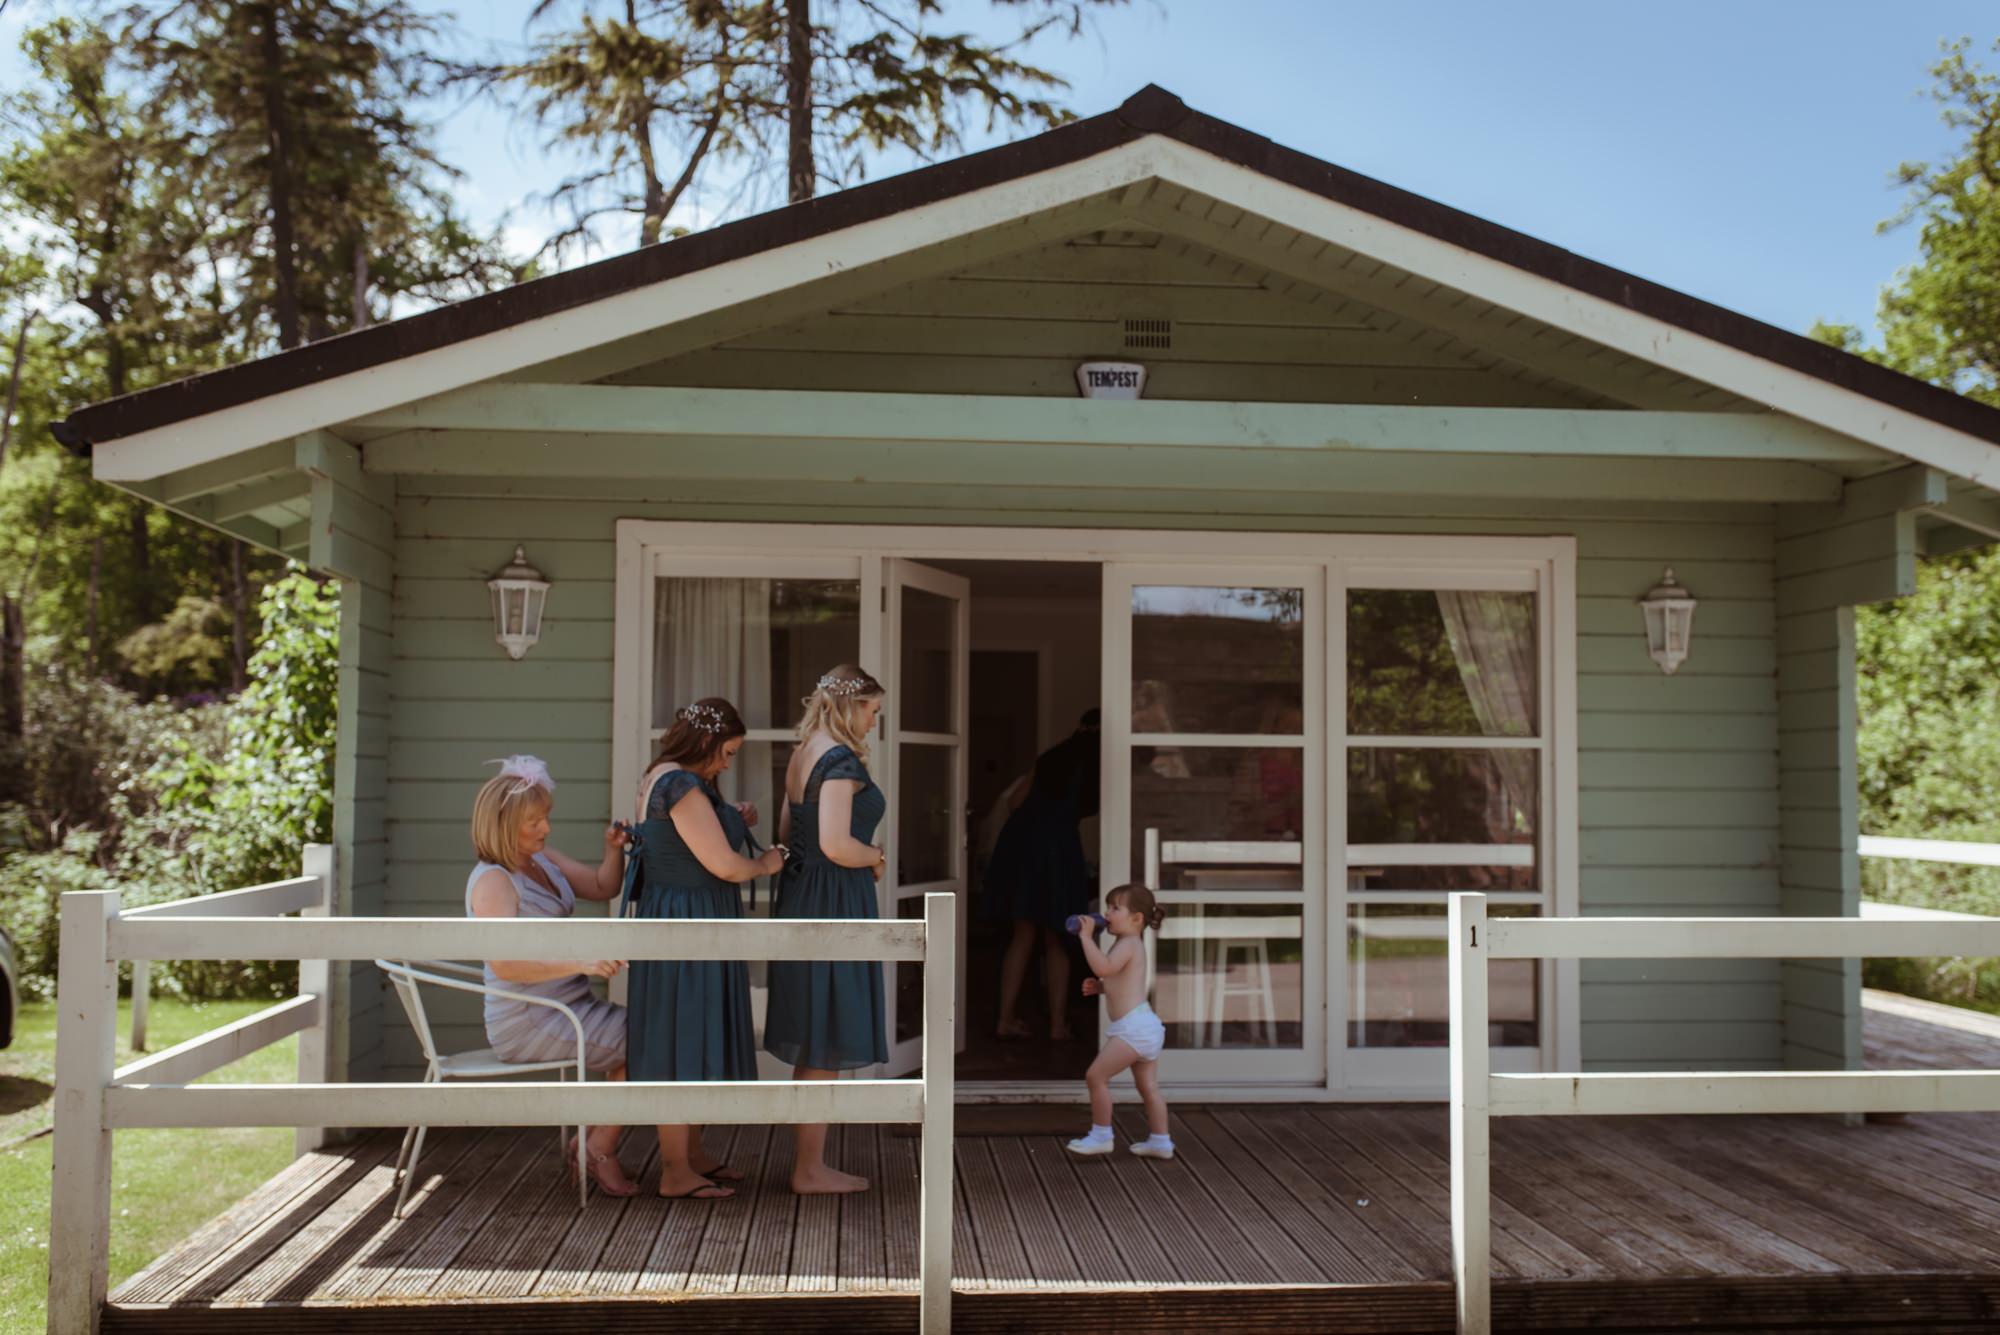 cruin-guest-lodges-wedding.jpg